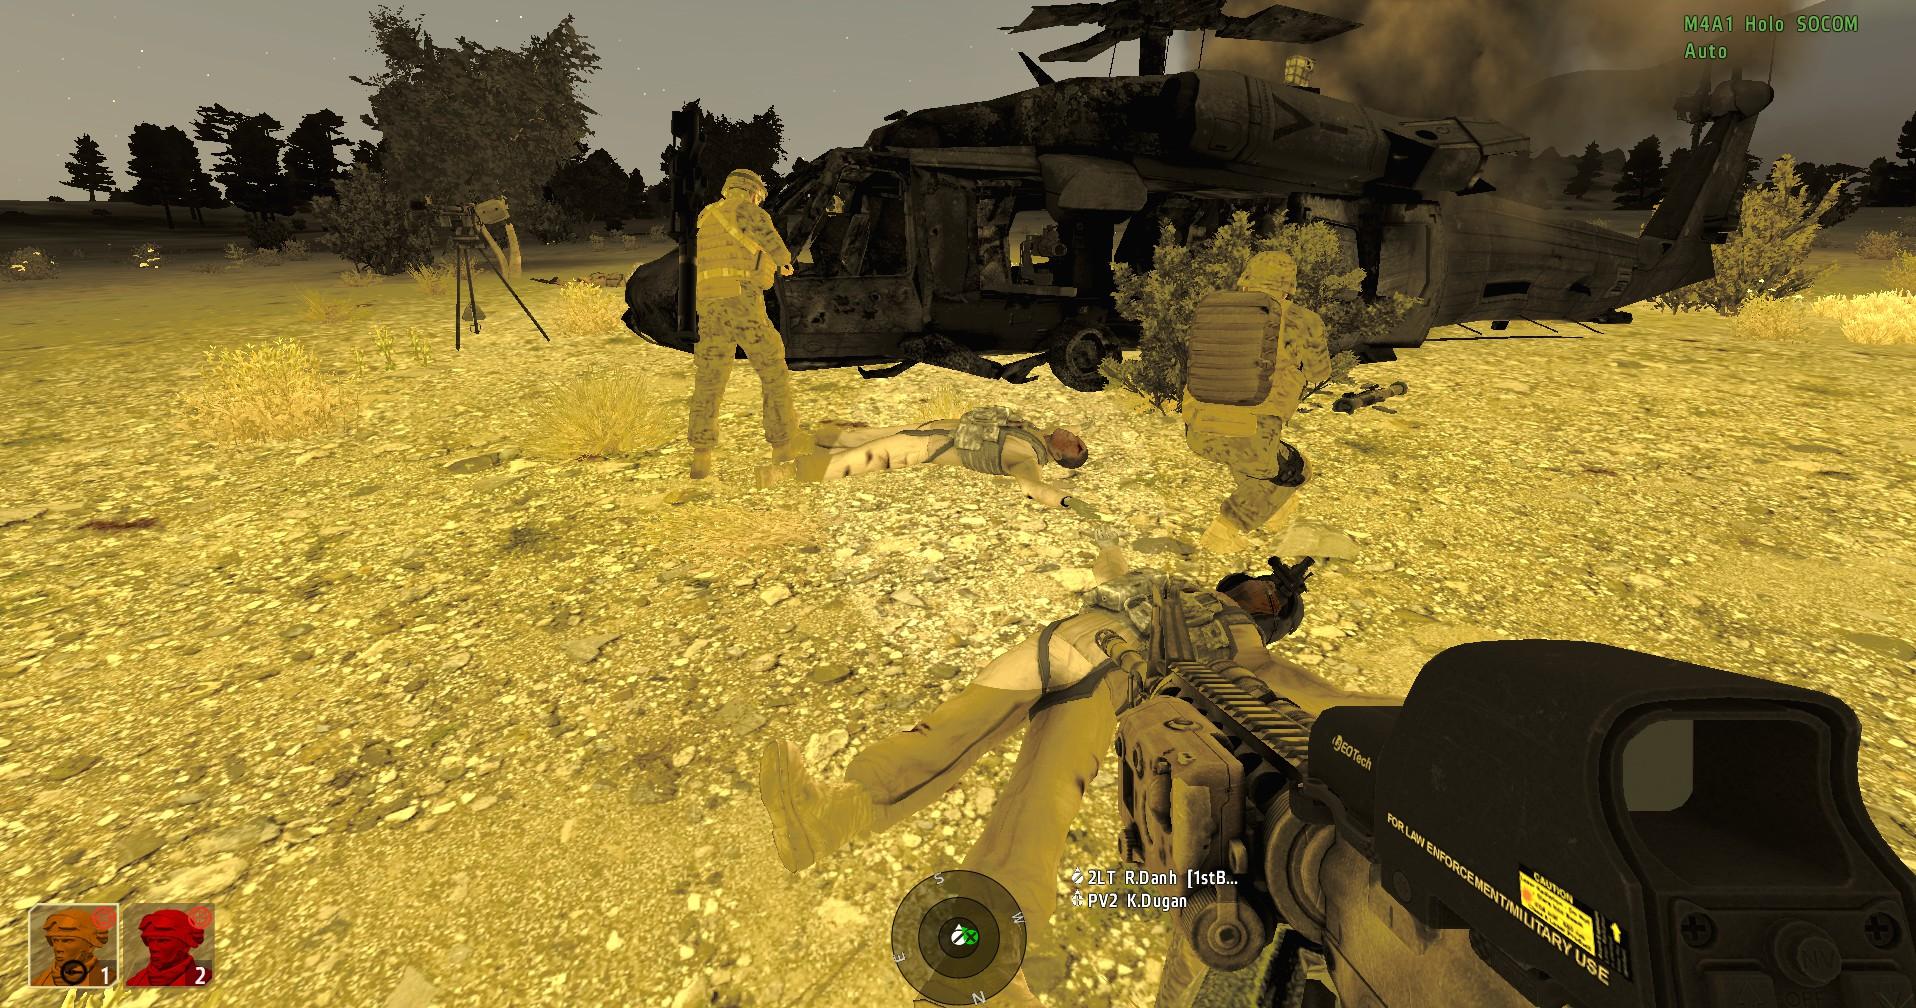 [Operation] Operation Behind Enemy Lines 3/04/17 [AAR] E0BB976635B37C019F299629EB1B1FB393456652